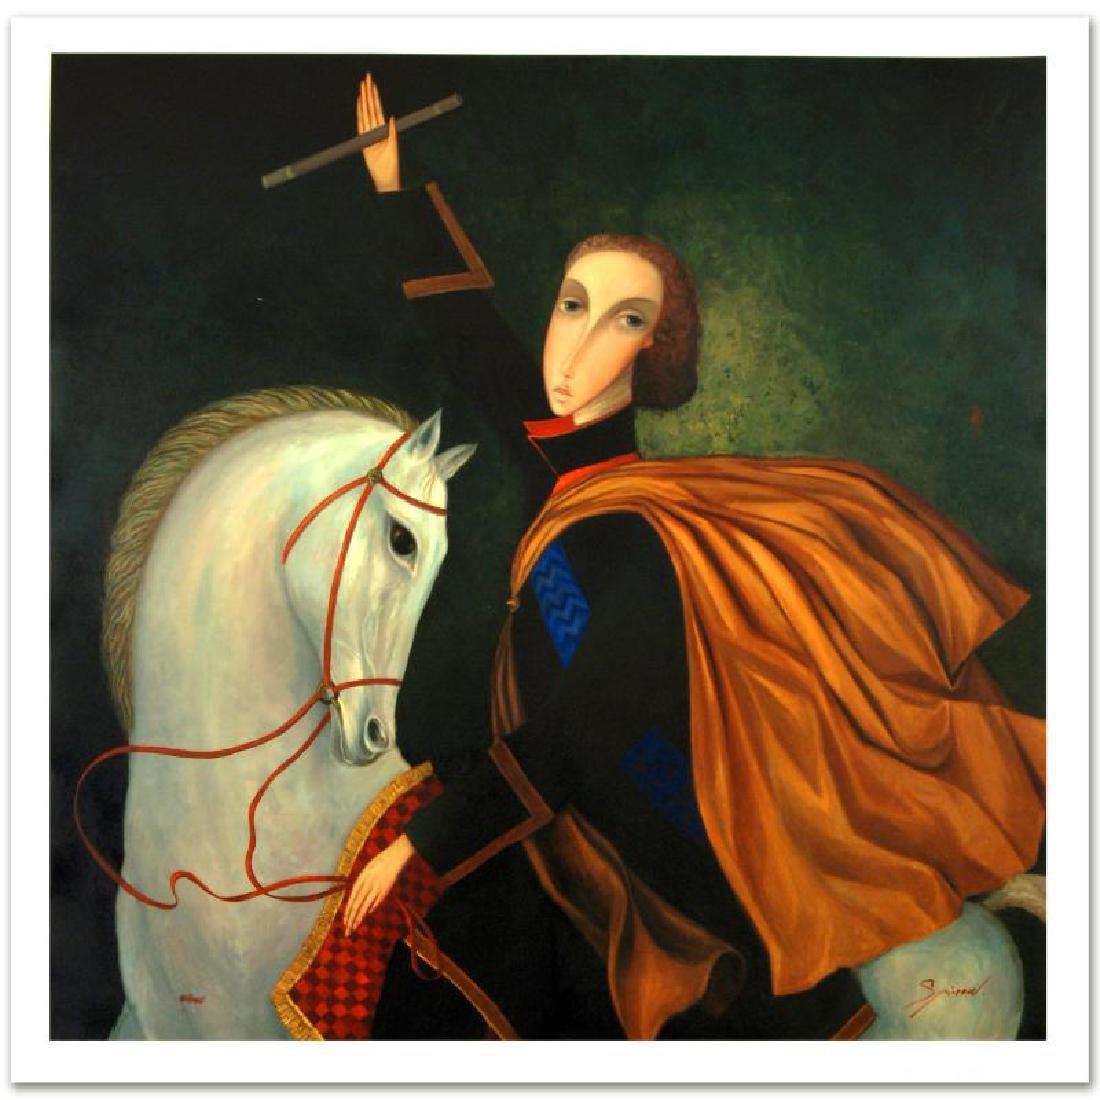 Peter The Great:Emperor by Smirnov (1953-2006)